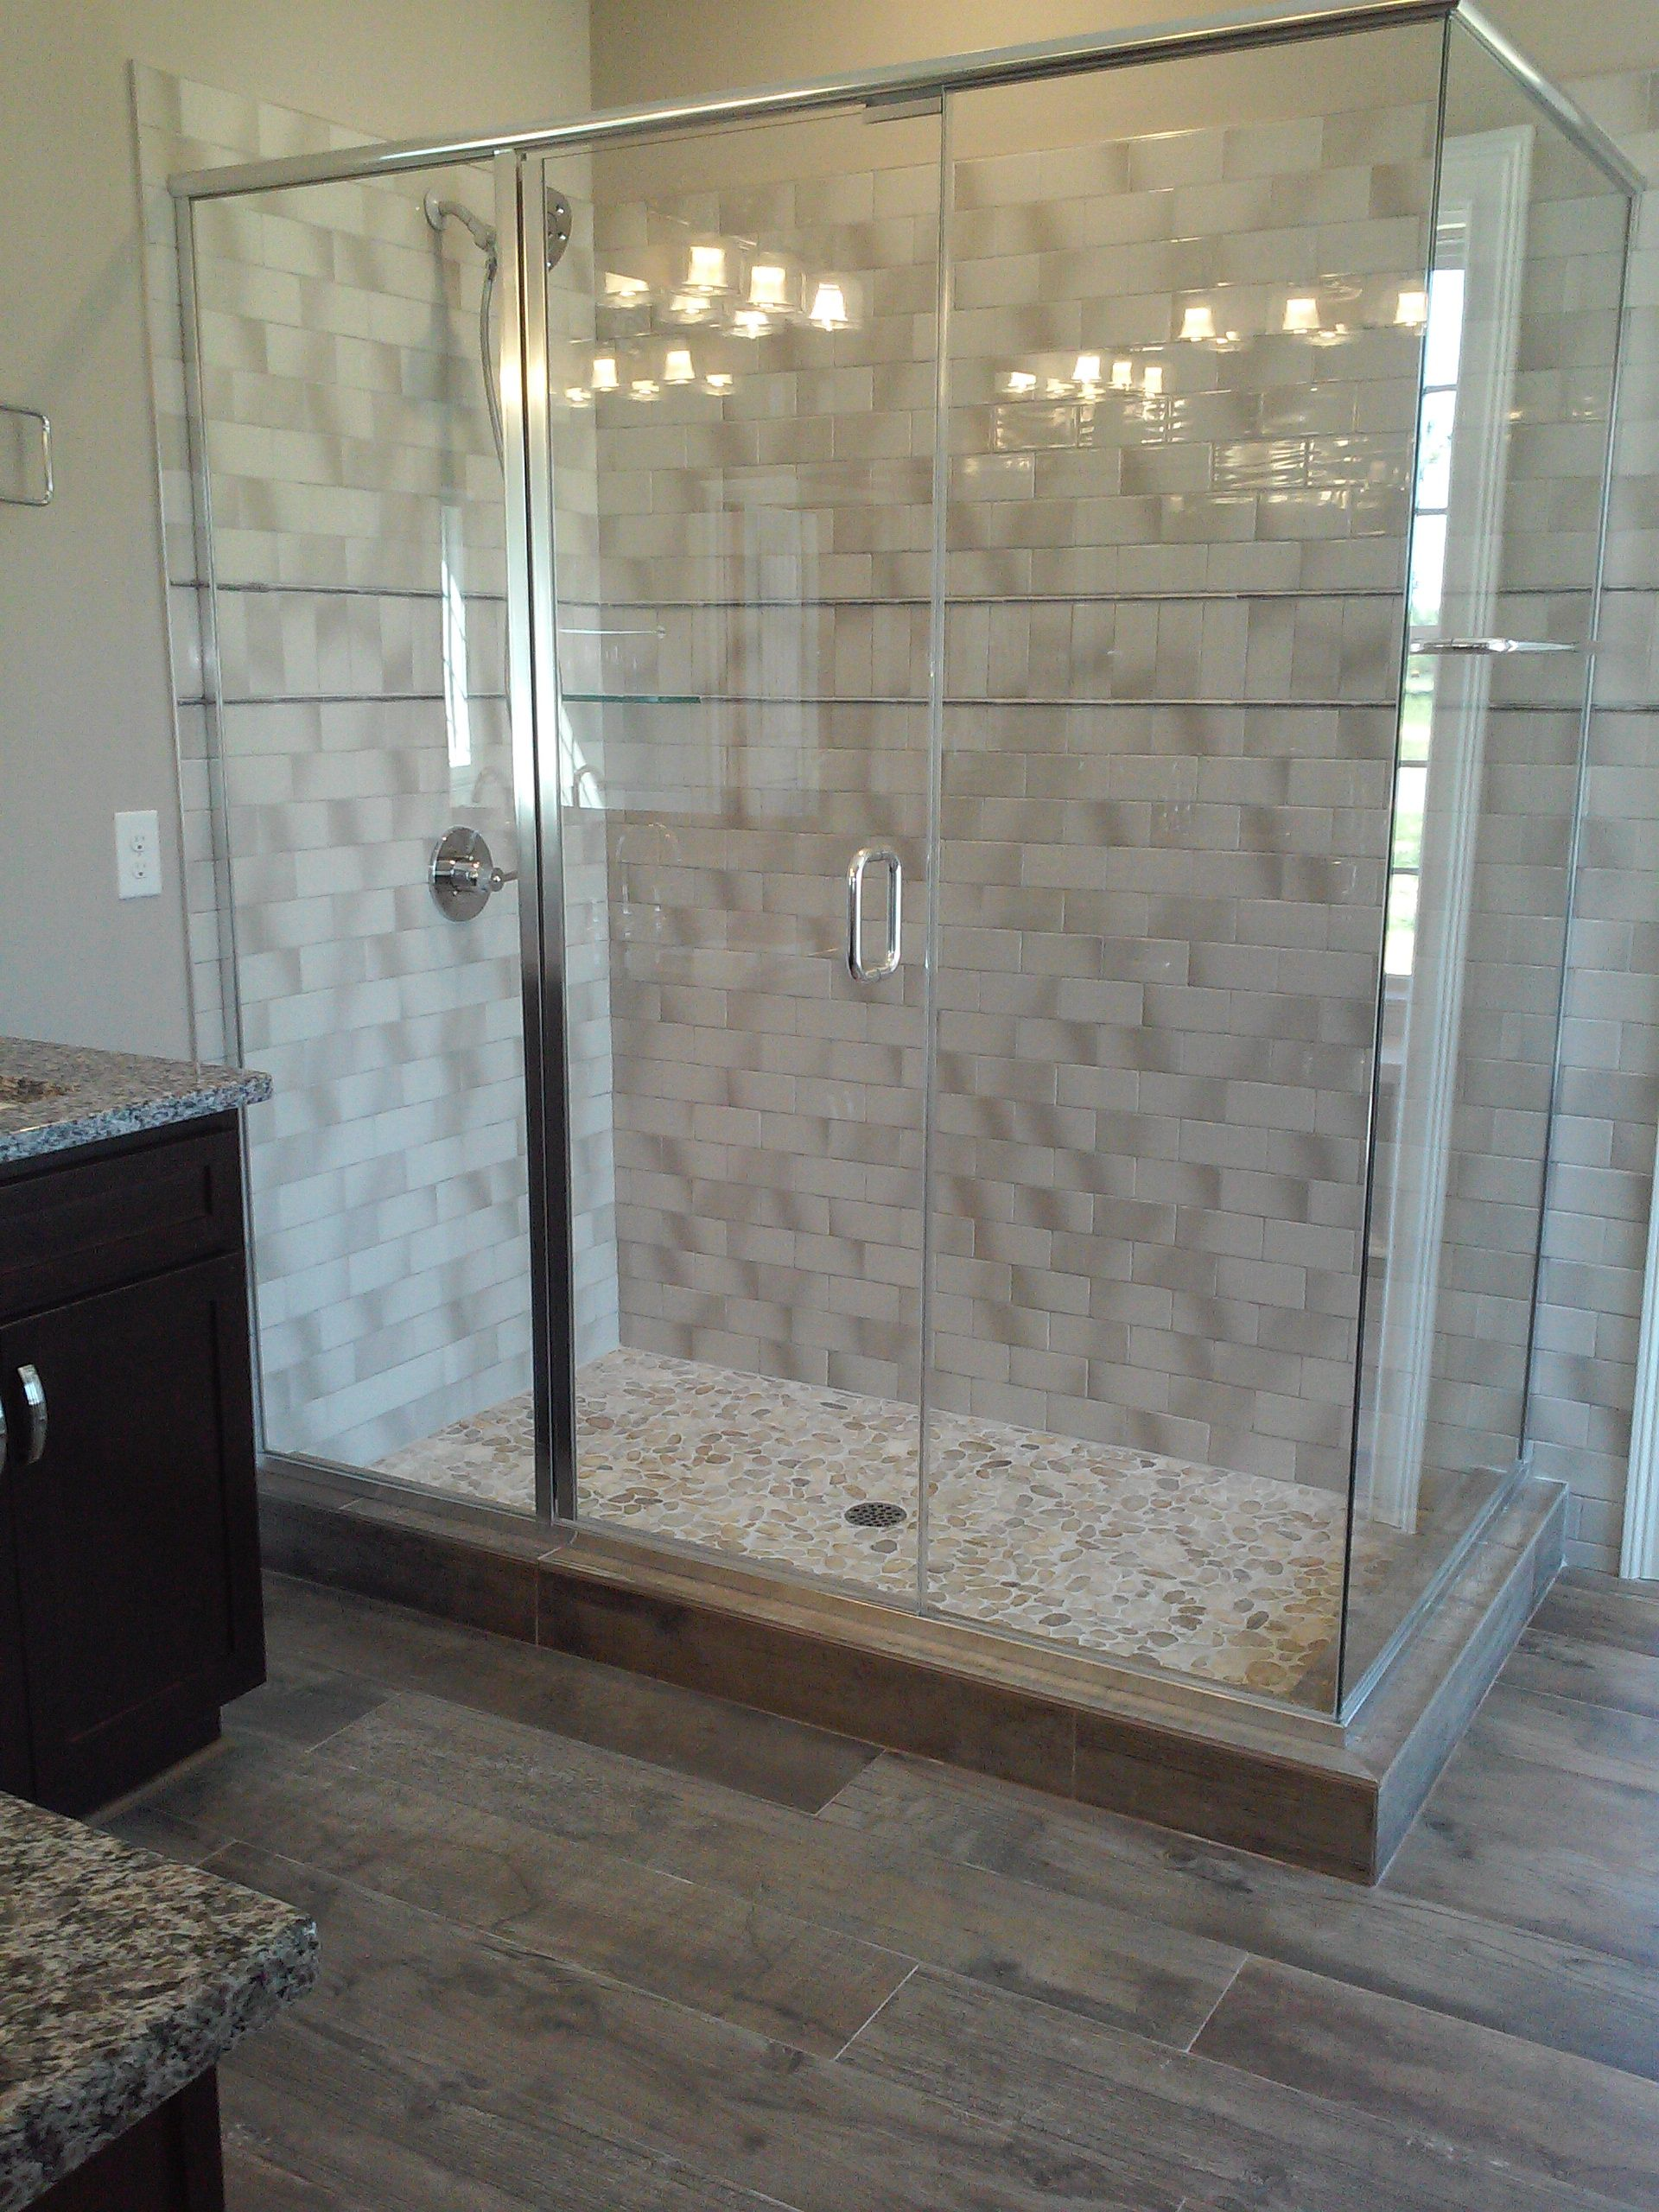 Master Bath Weathered Wood Look Tile Floor Gray Subway Tile